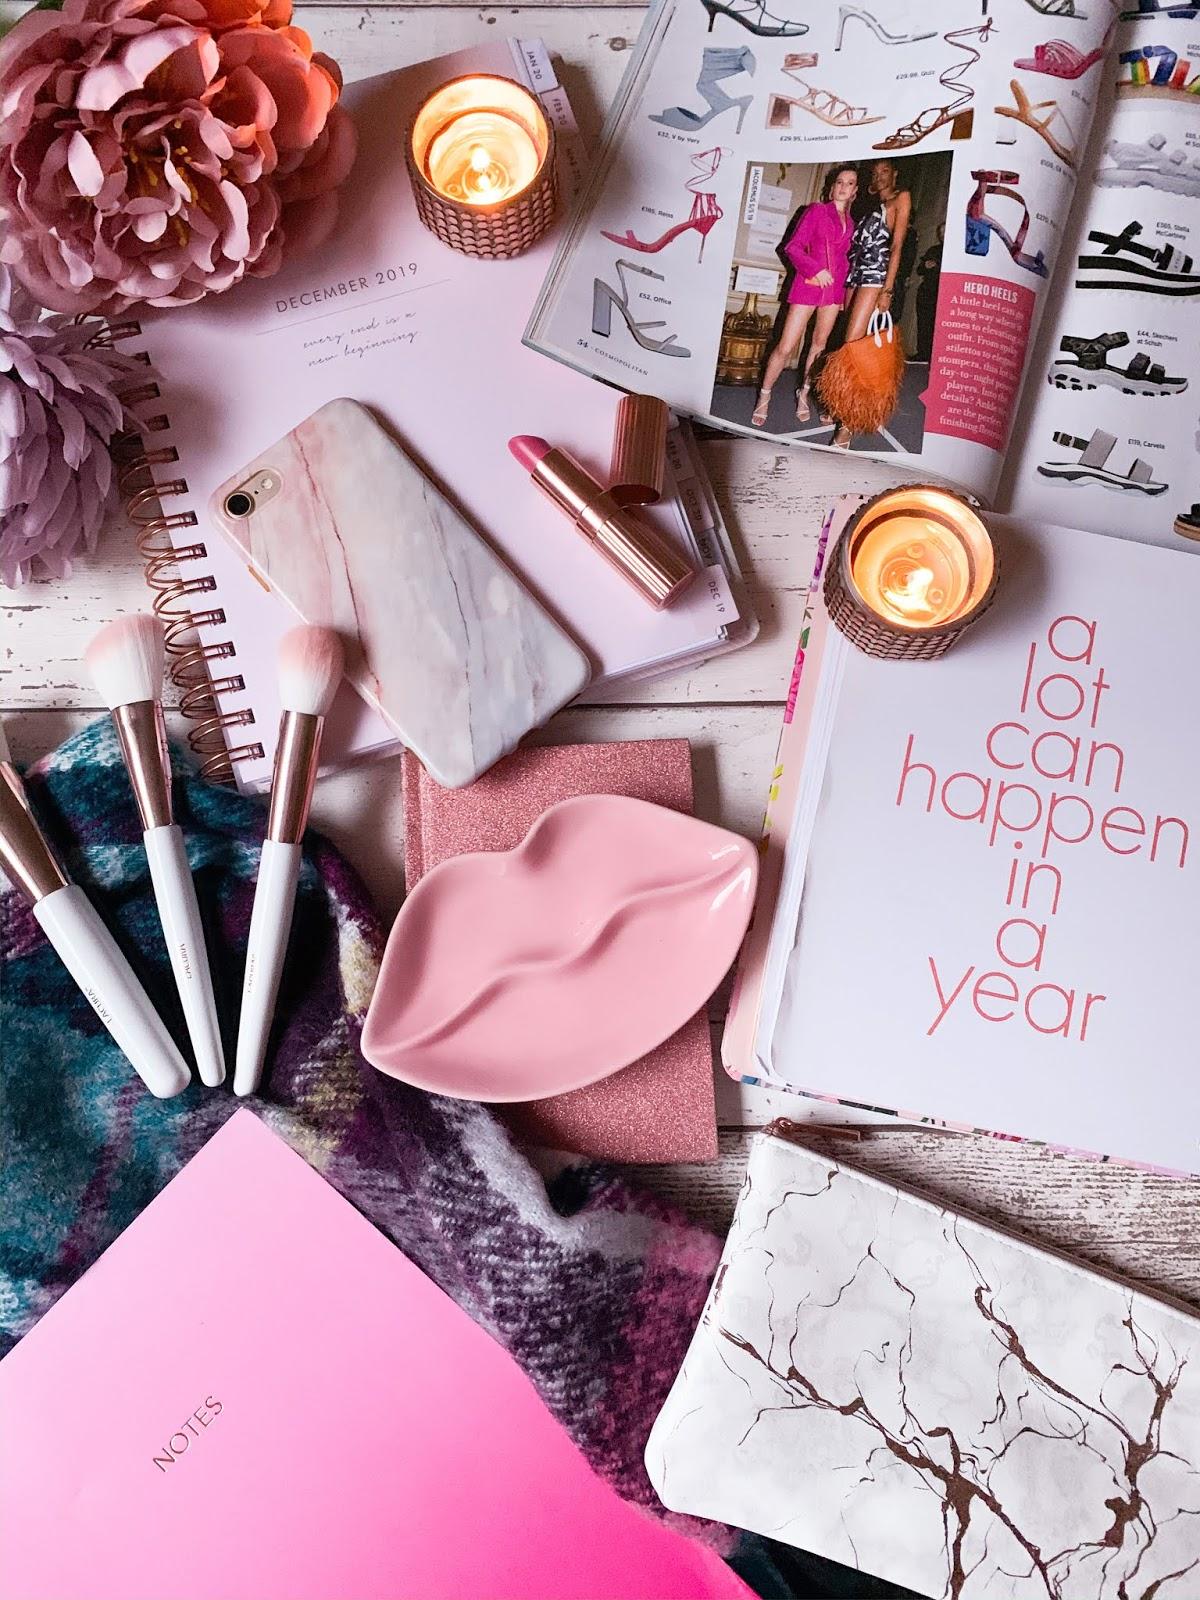 My Best Blog Posts of 2019